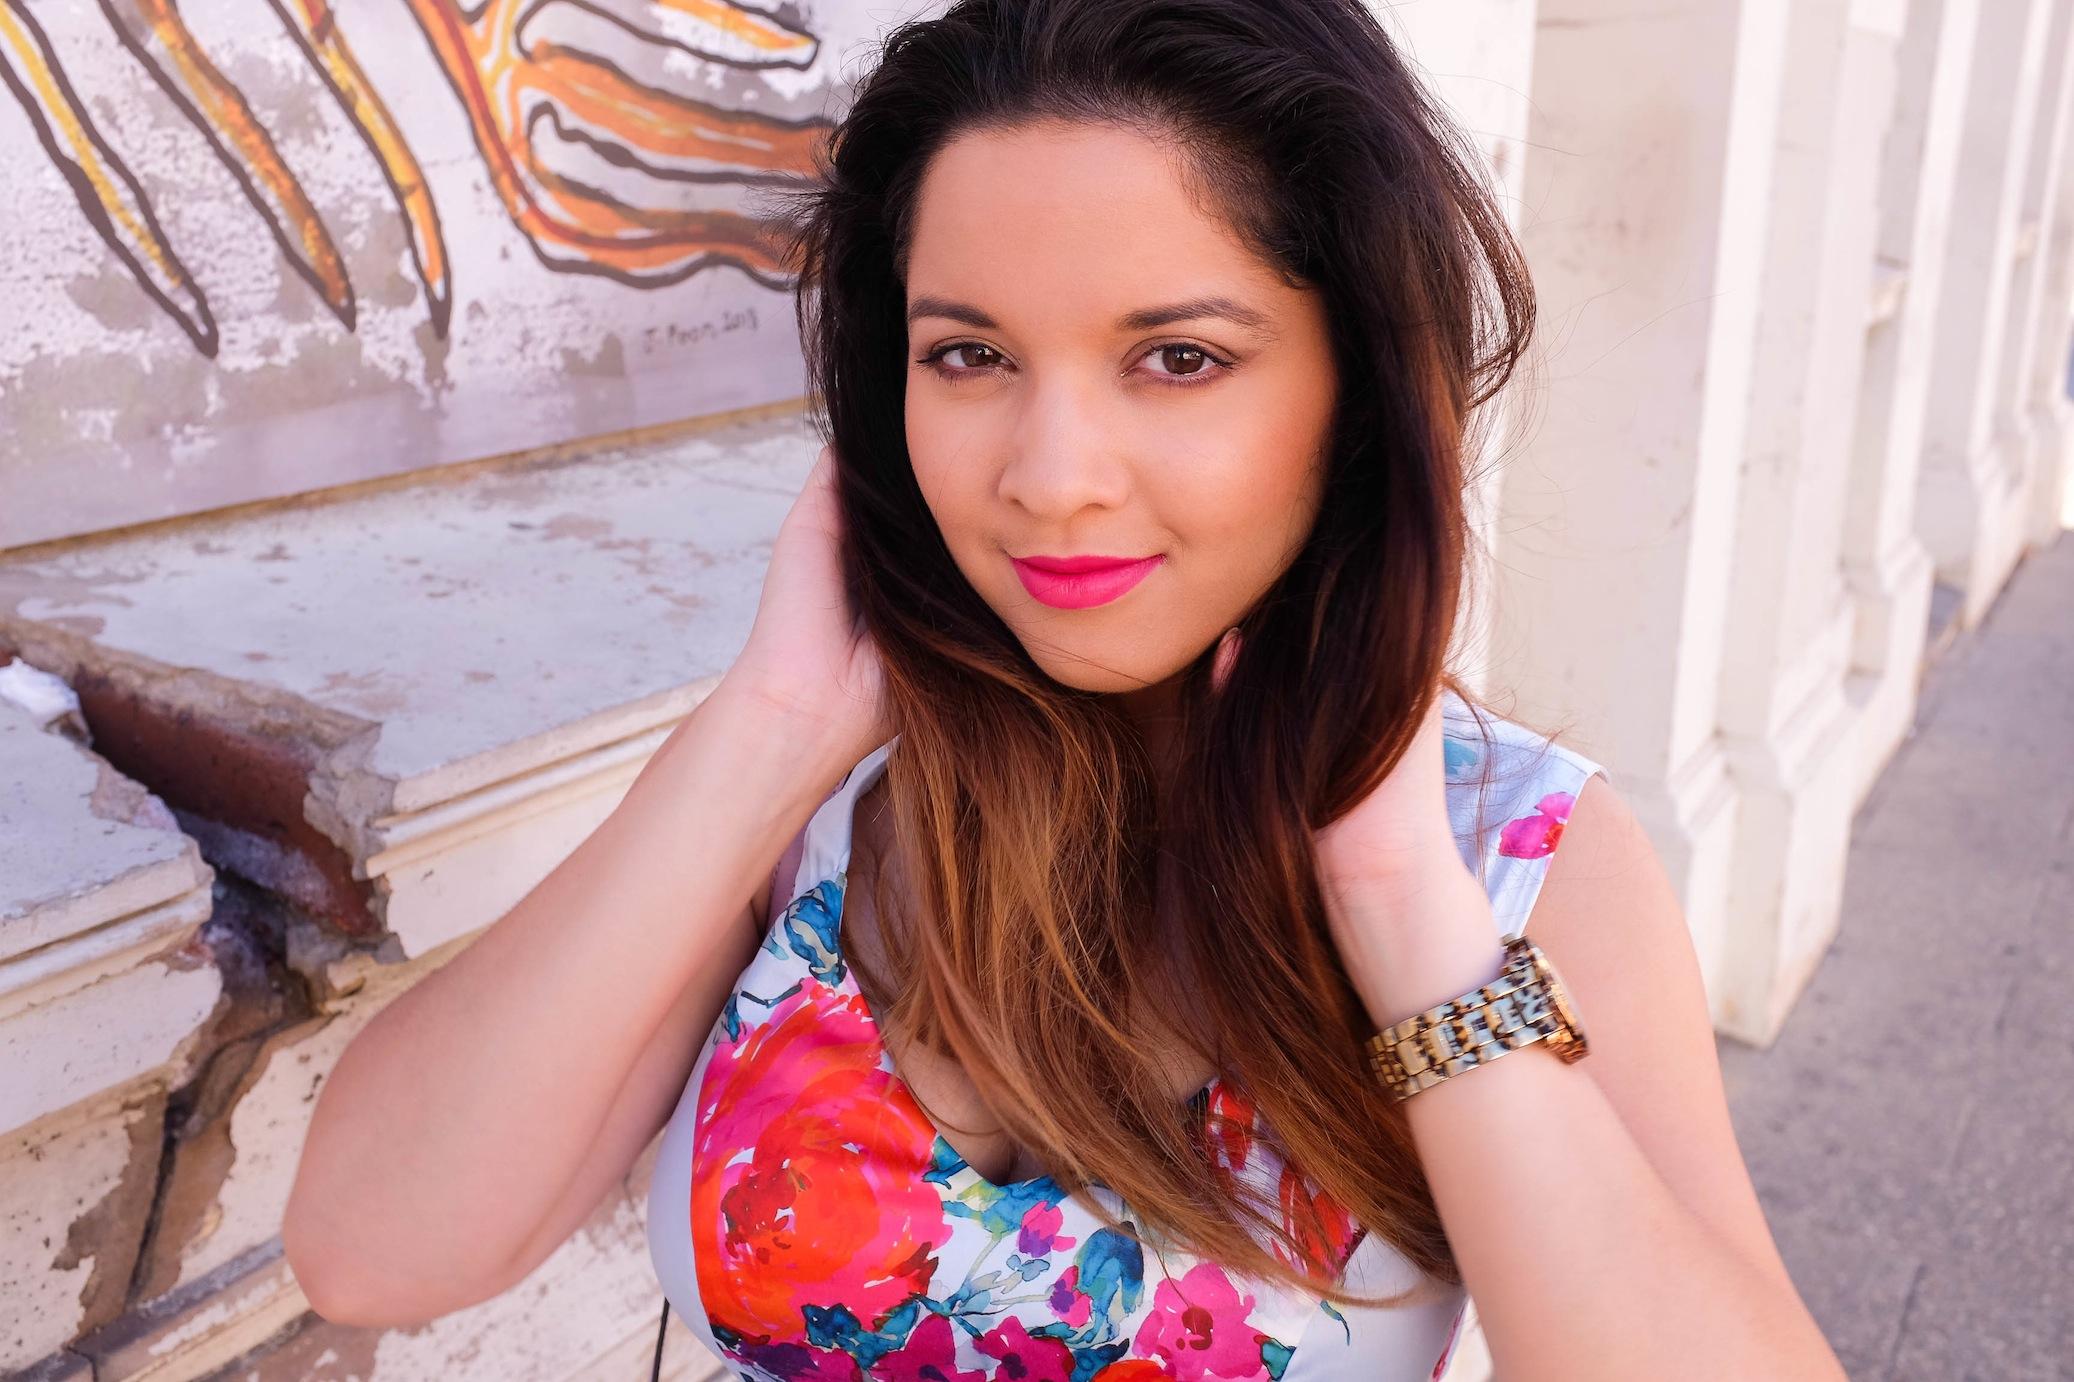 nezuki, fremantle, mimco, review, floral, fiesta, leather, orange heels, floral print, dress, day dress, guess, fashion, style, fashion photography, vanessa collars, stylish, perth, sydney, sydney blogger, fashion blogger, cute, kawaii, street style